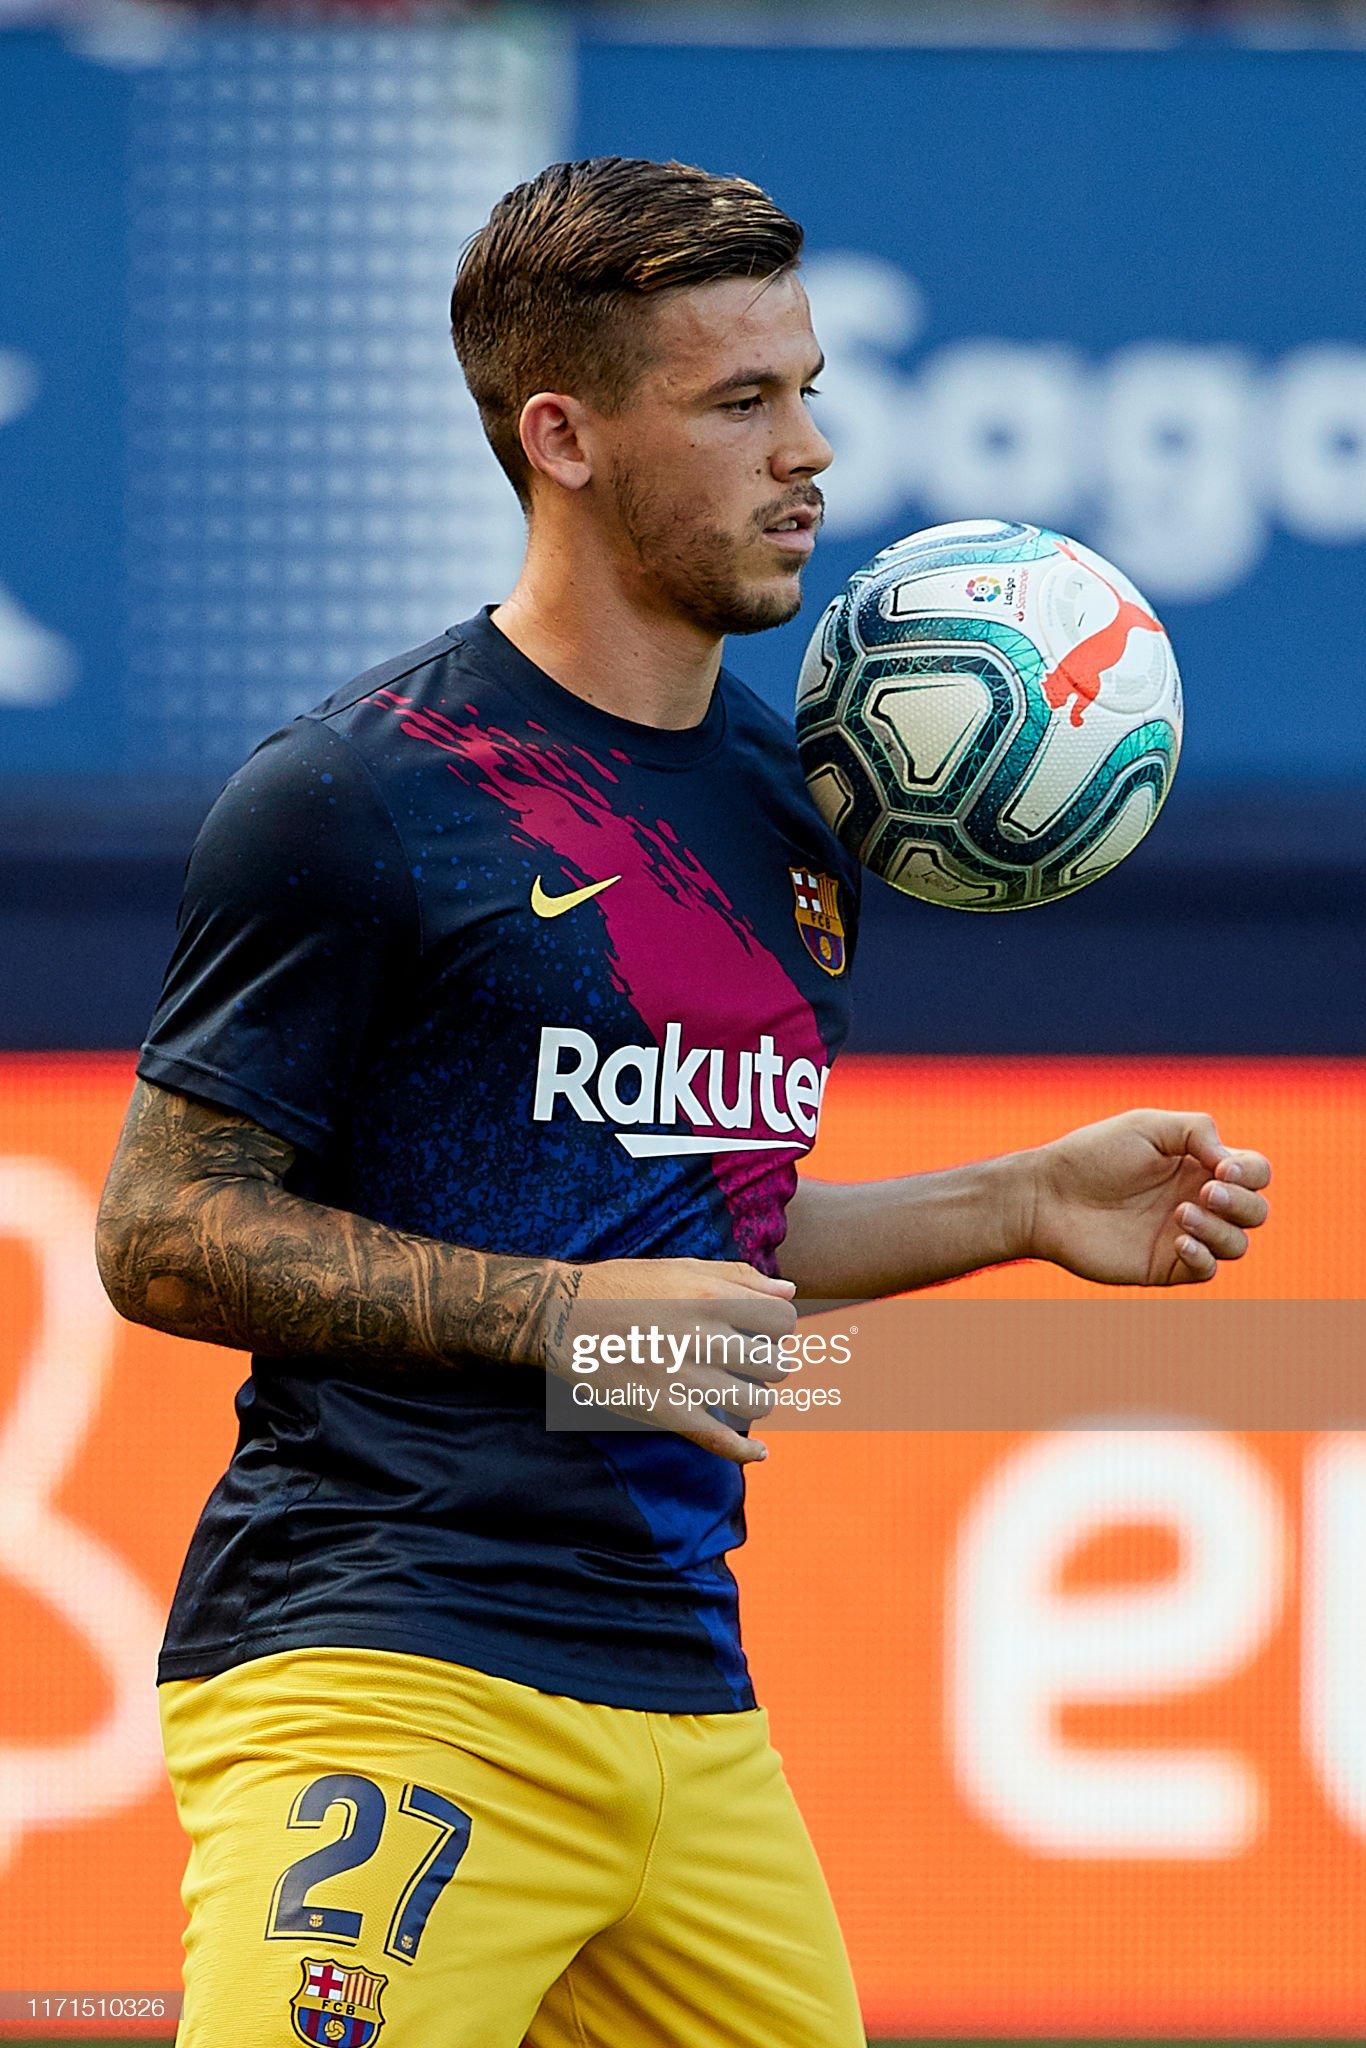 صور مباراة : أوساسونا - برشلونة 2-2 ( 31-08-2019 )  Carles-perez-of-fc-barcelona-during-the-prematch-warm-up-prior-to-the-picture-id1171510326?s=2048x2048